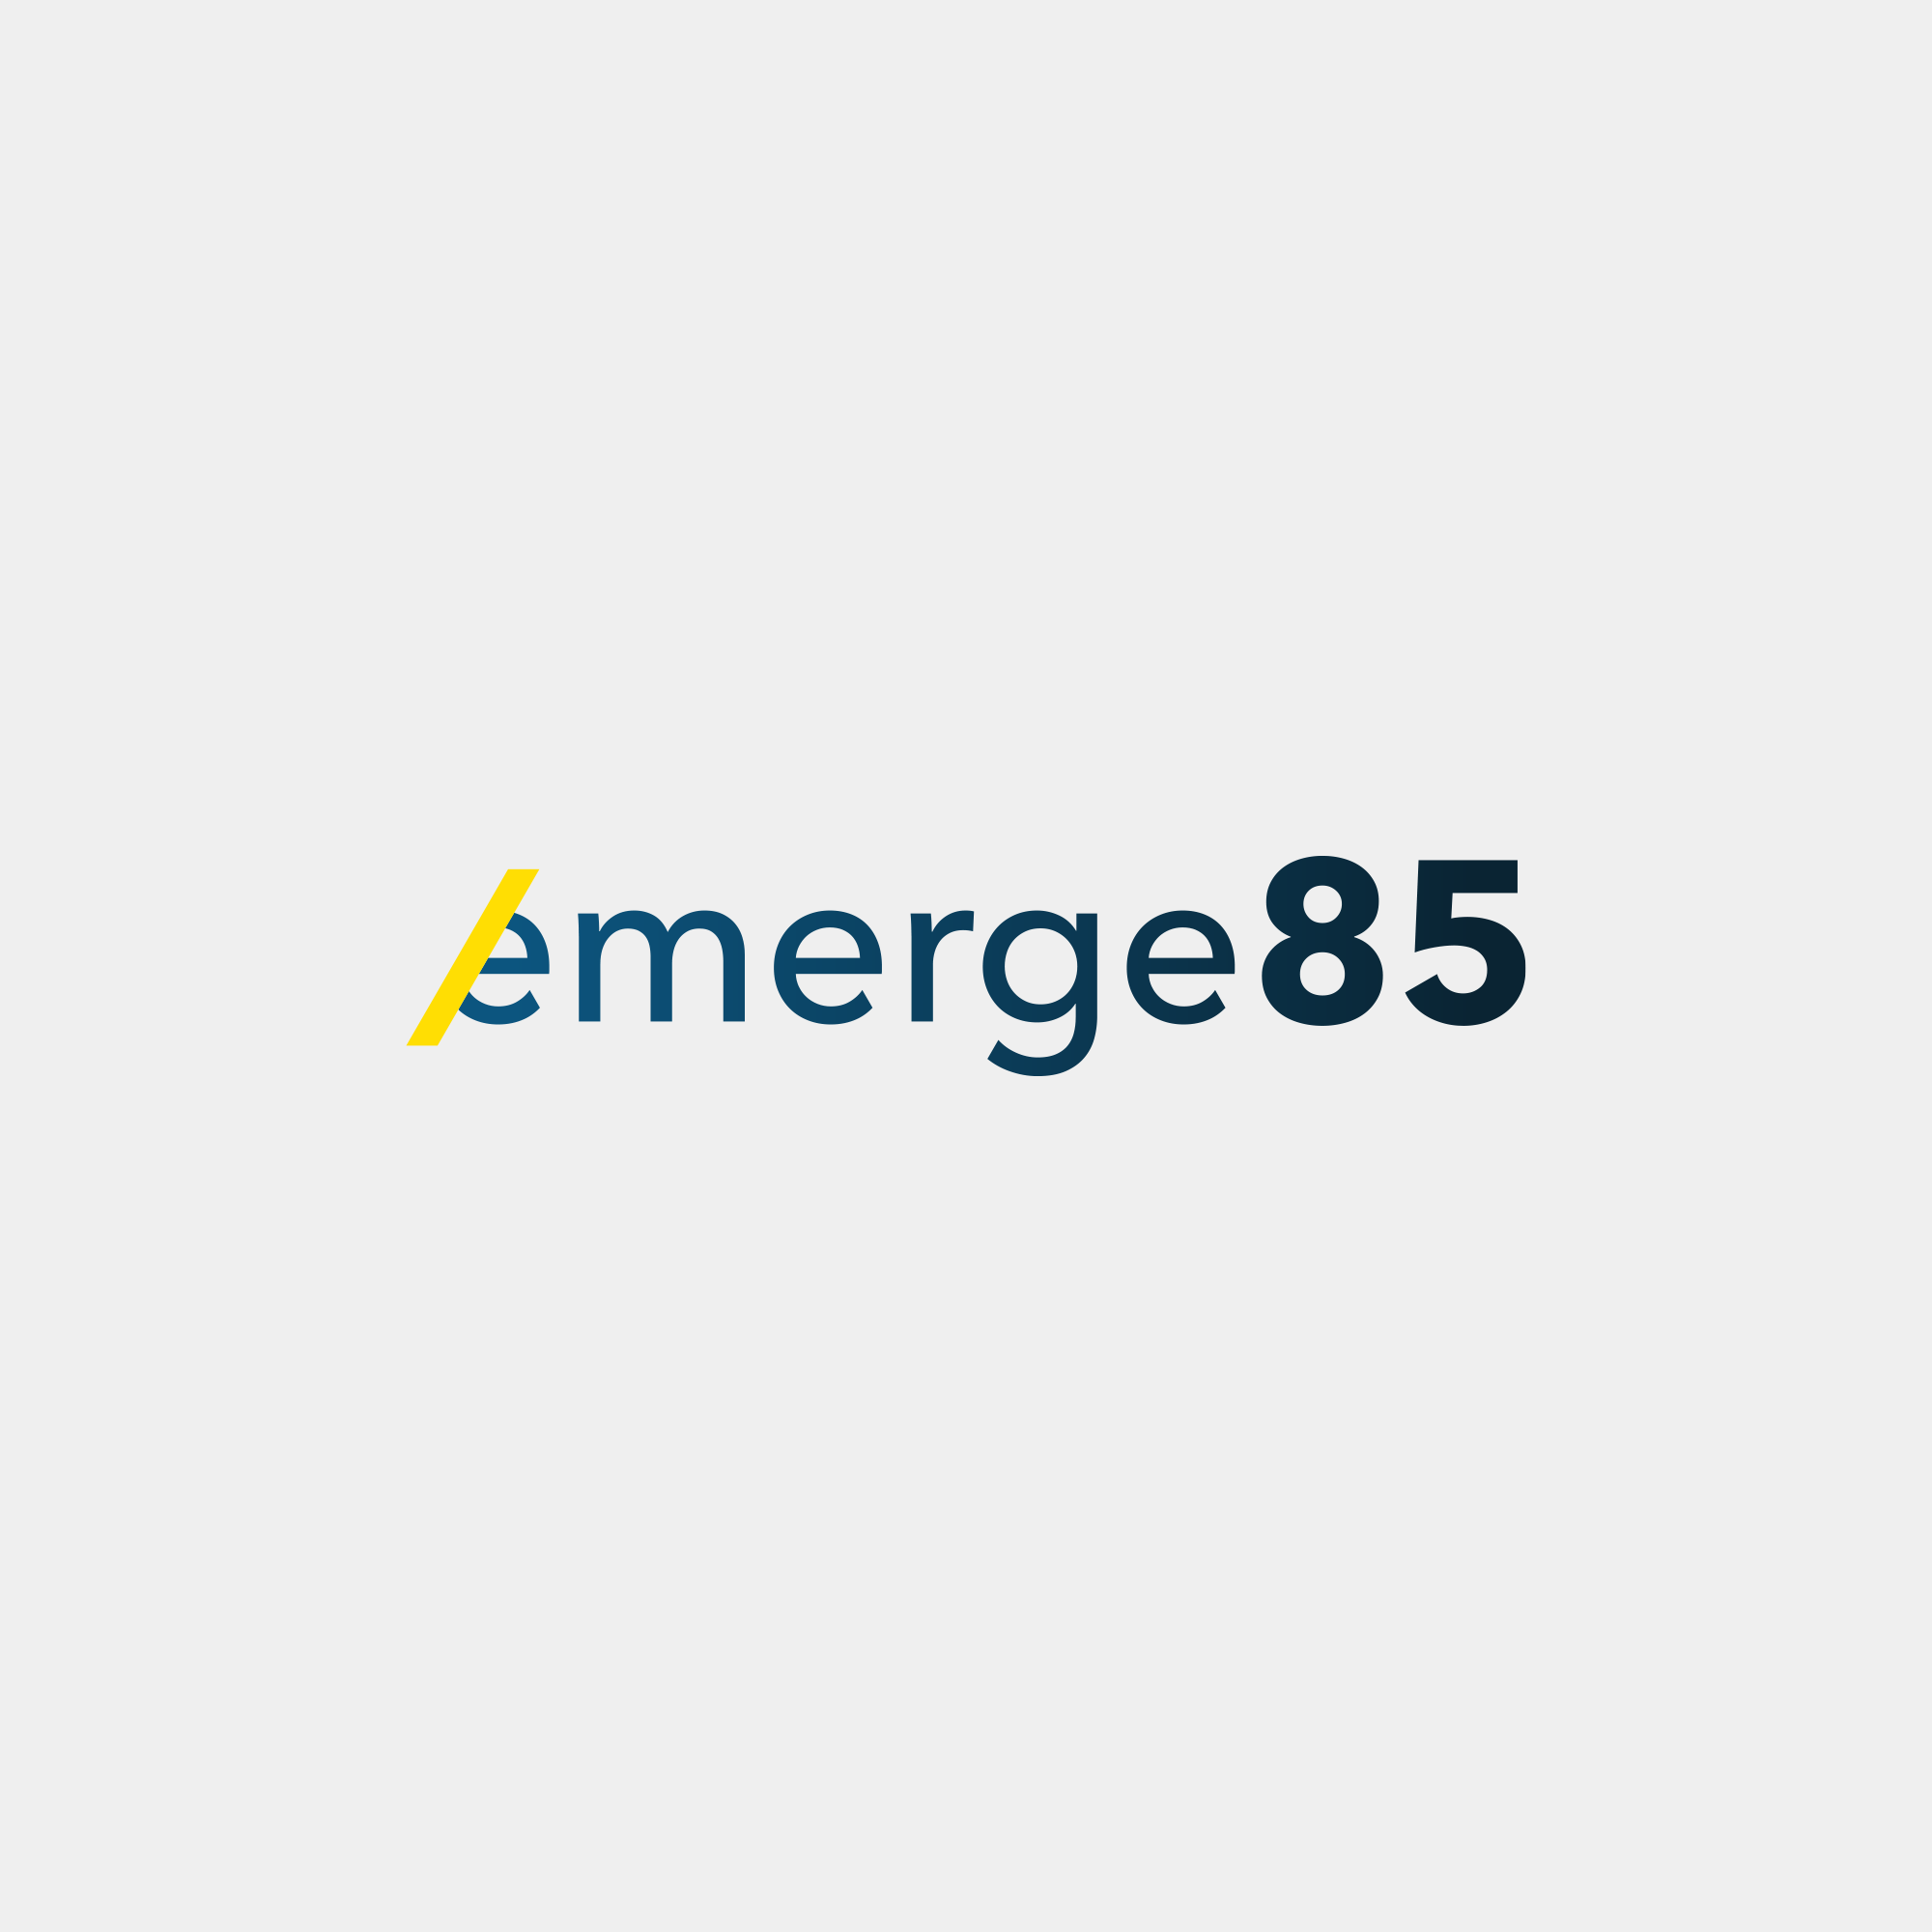 Emerge85 branding logo design